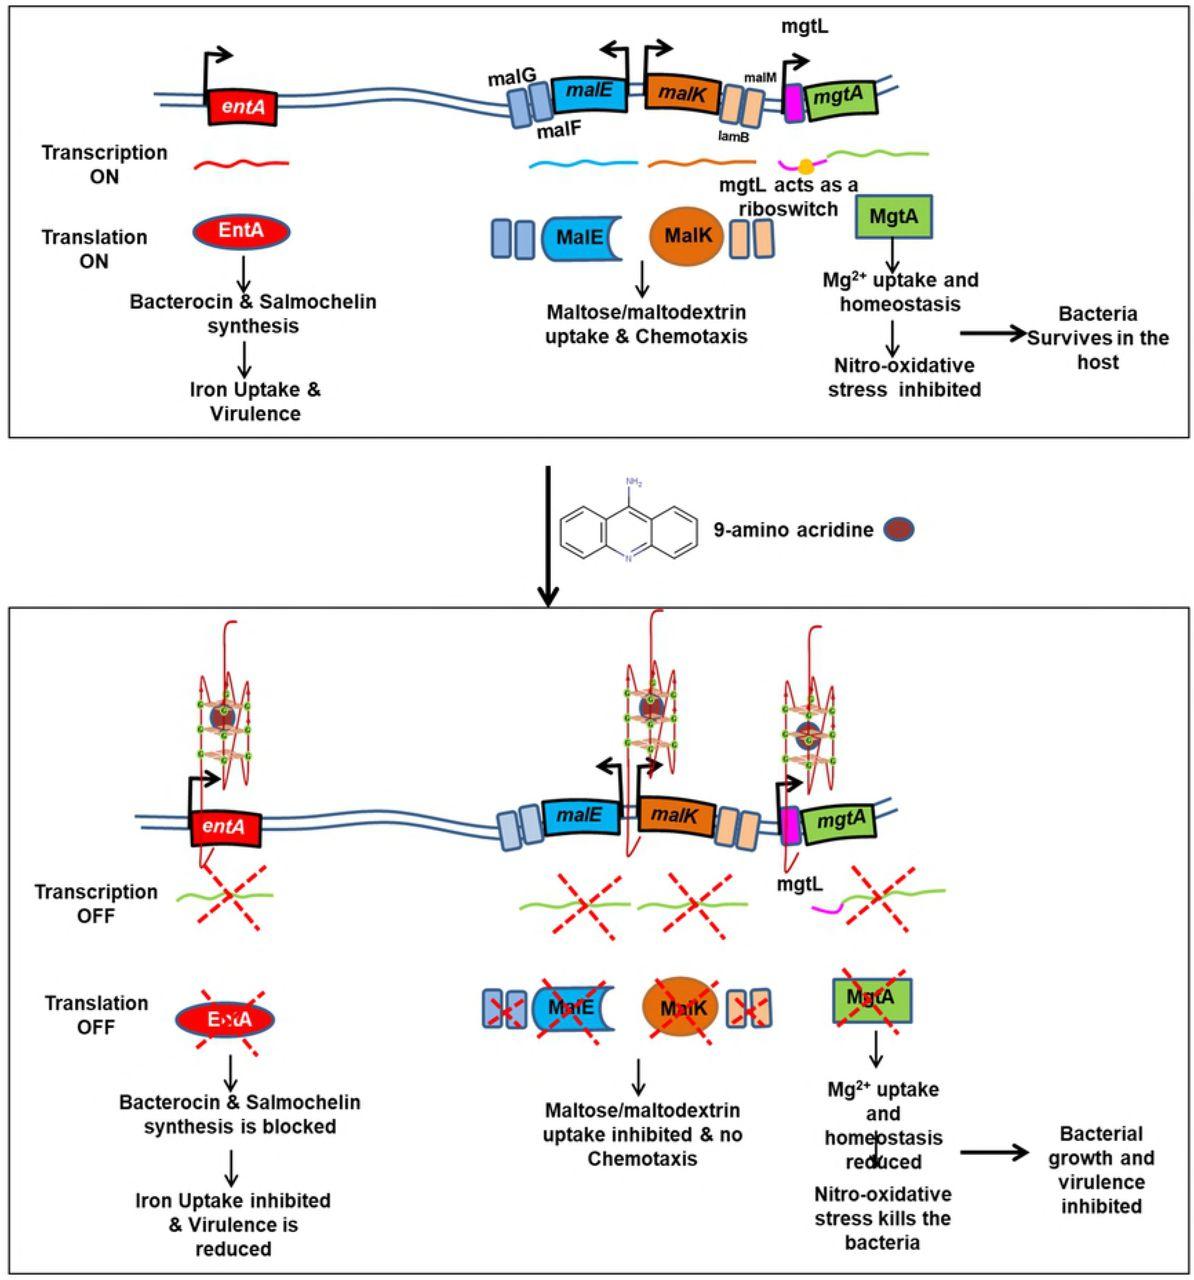 G-quadruplex stabilization in the ions and maltose transporters